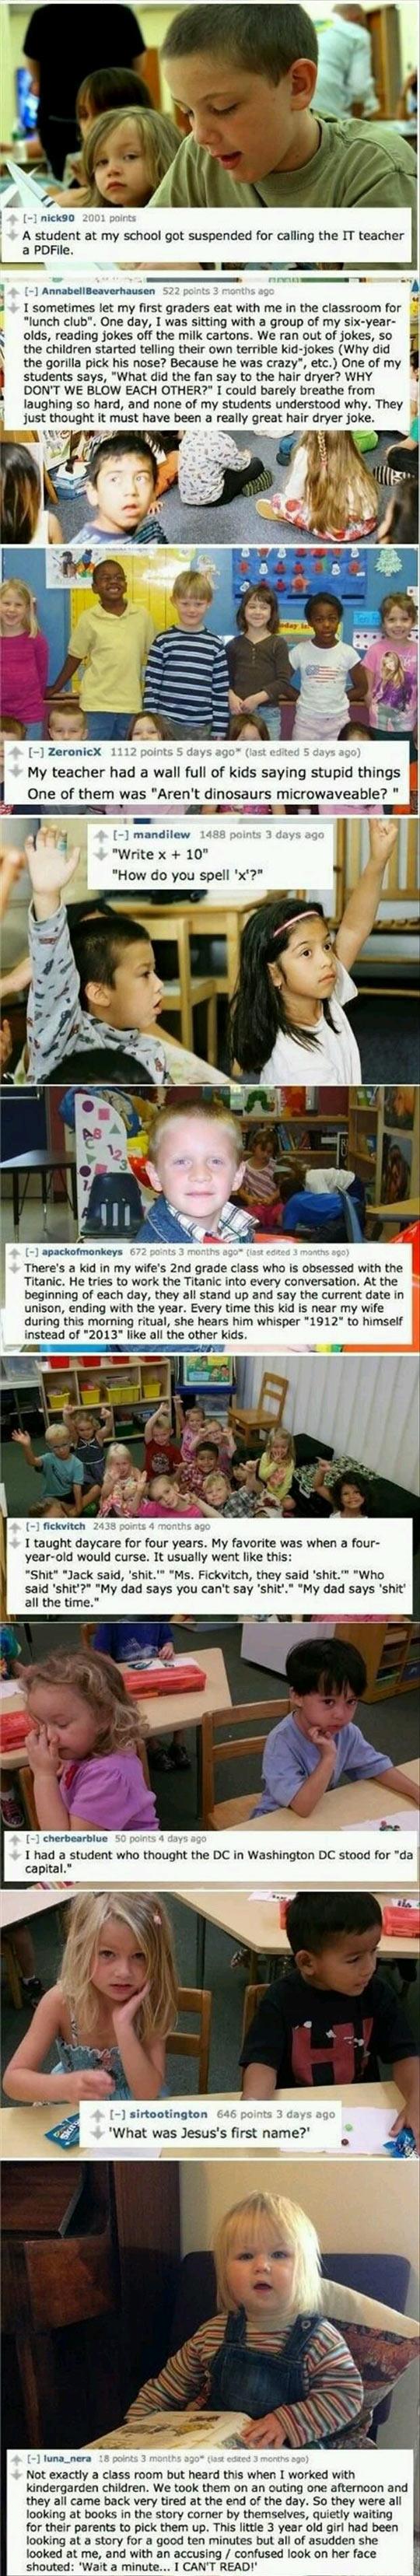 funny-kids-saying-things-teachers-school